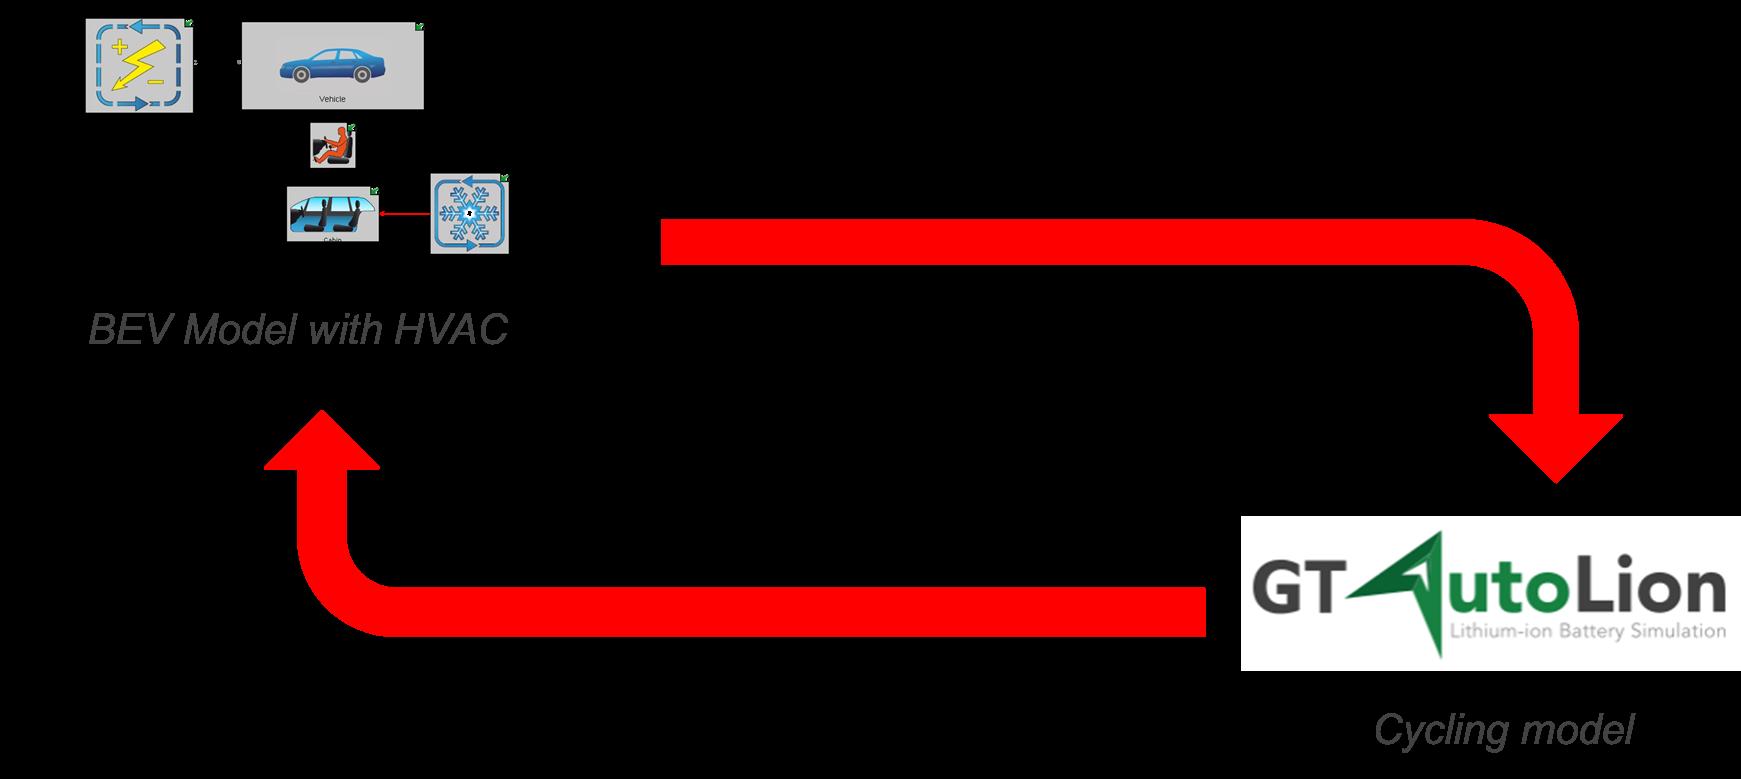 BEV-HVAC-and-battery